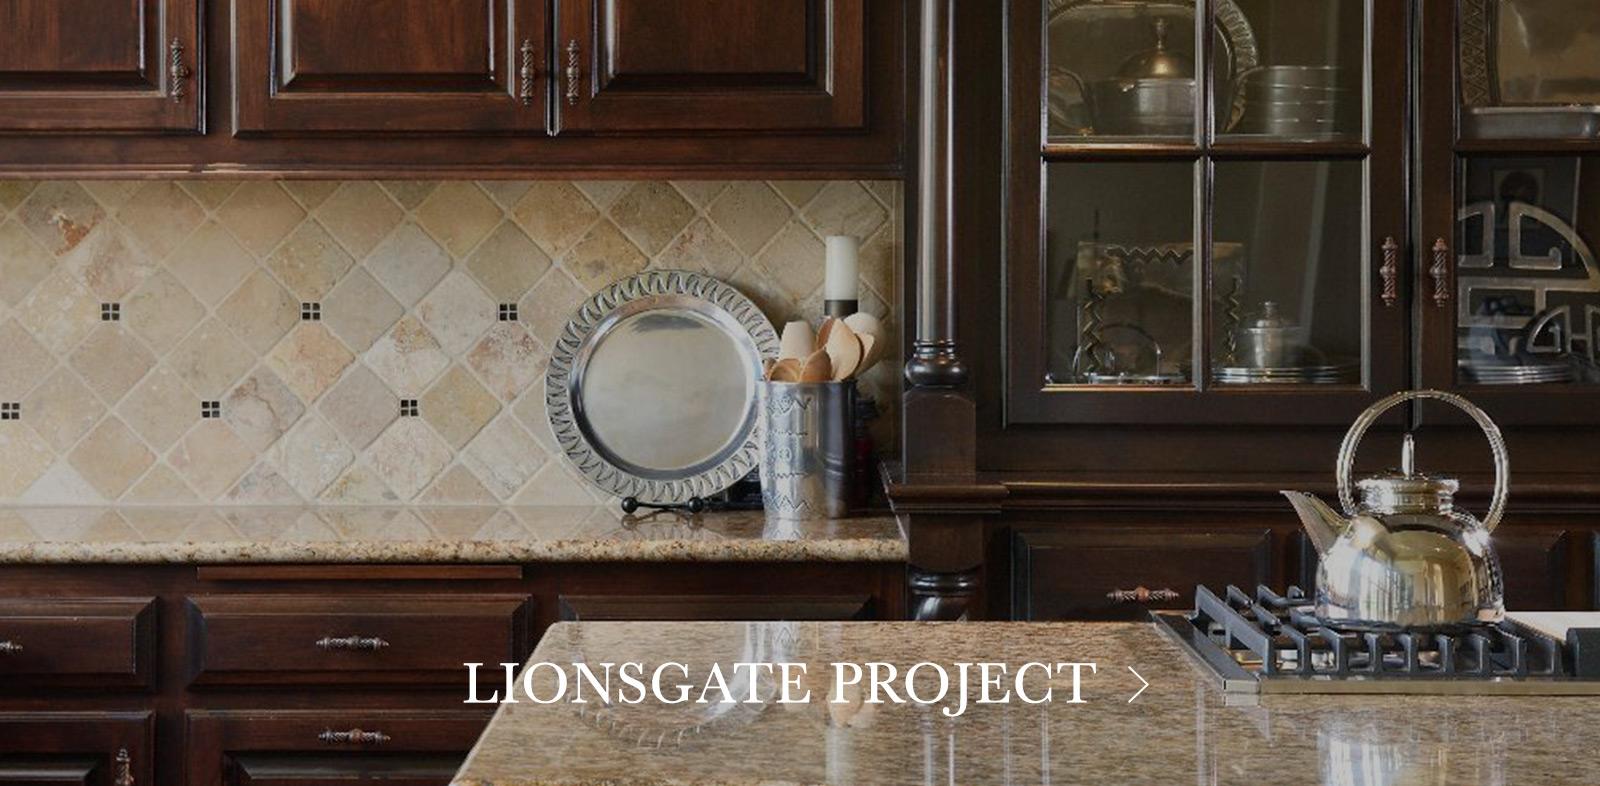 Lionsgate-Project.jpg